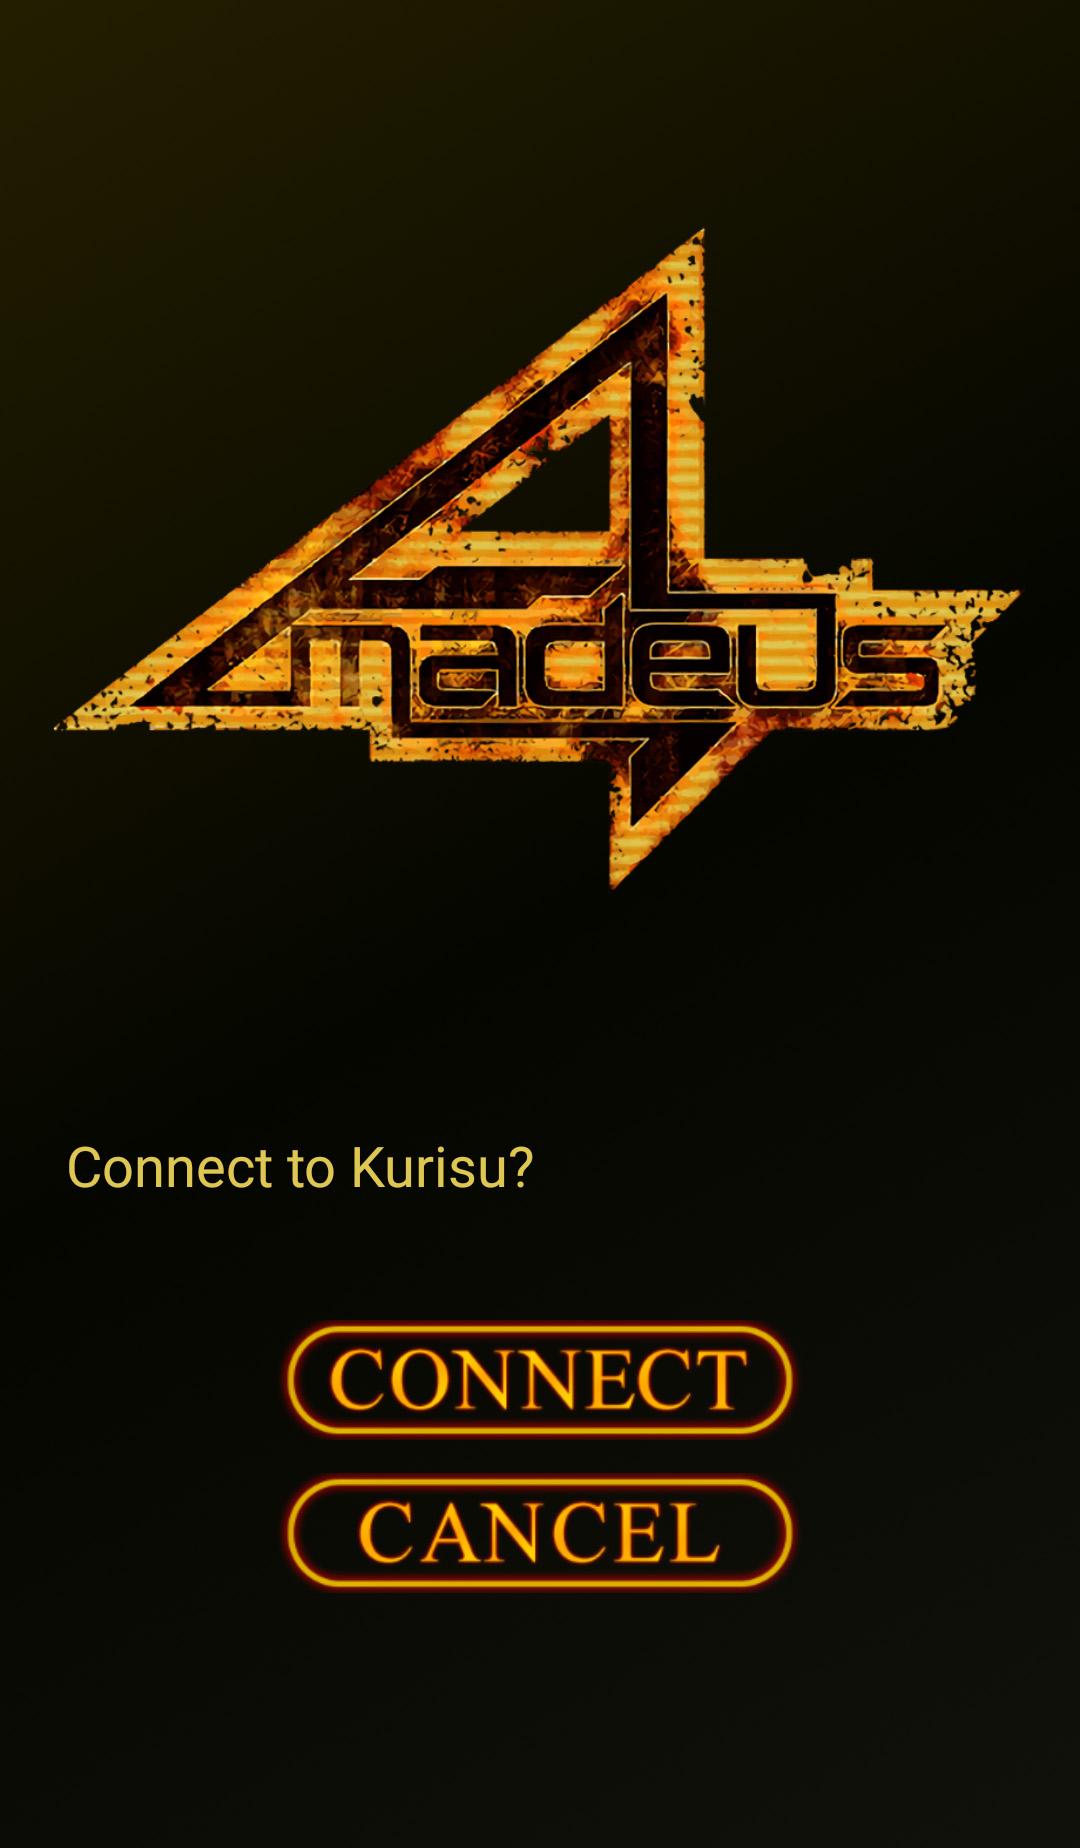 Amadeus, de Steins;Gate 0